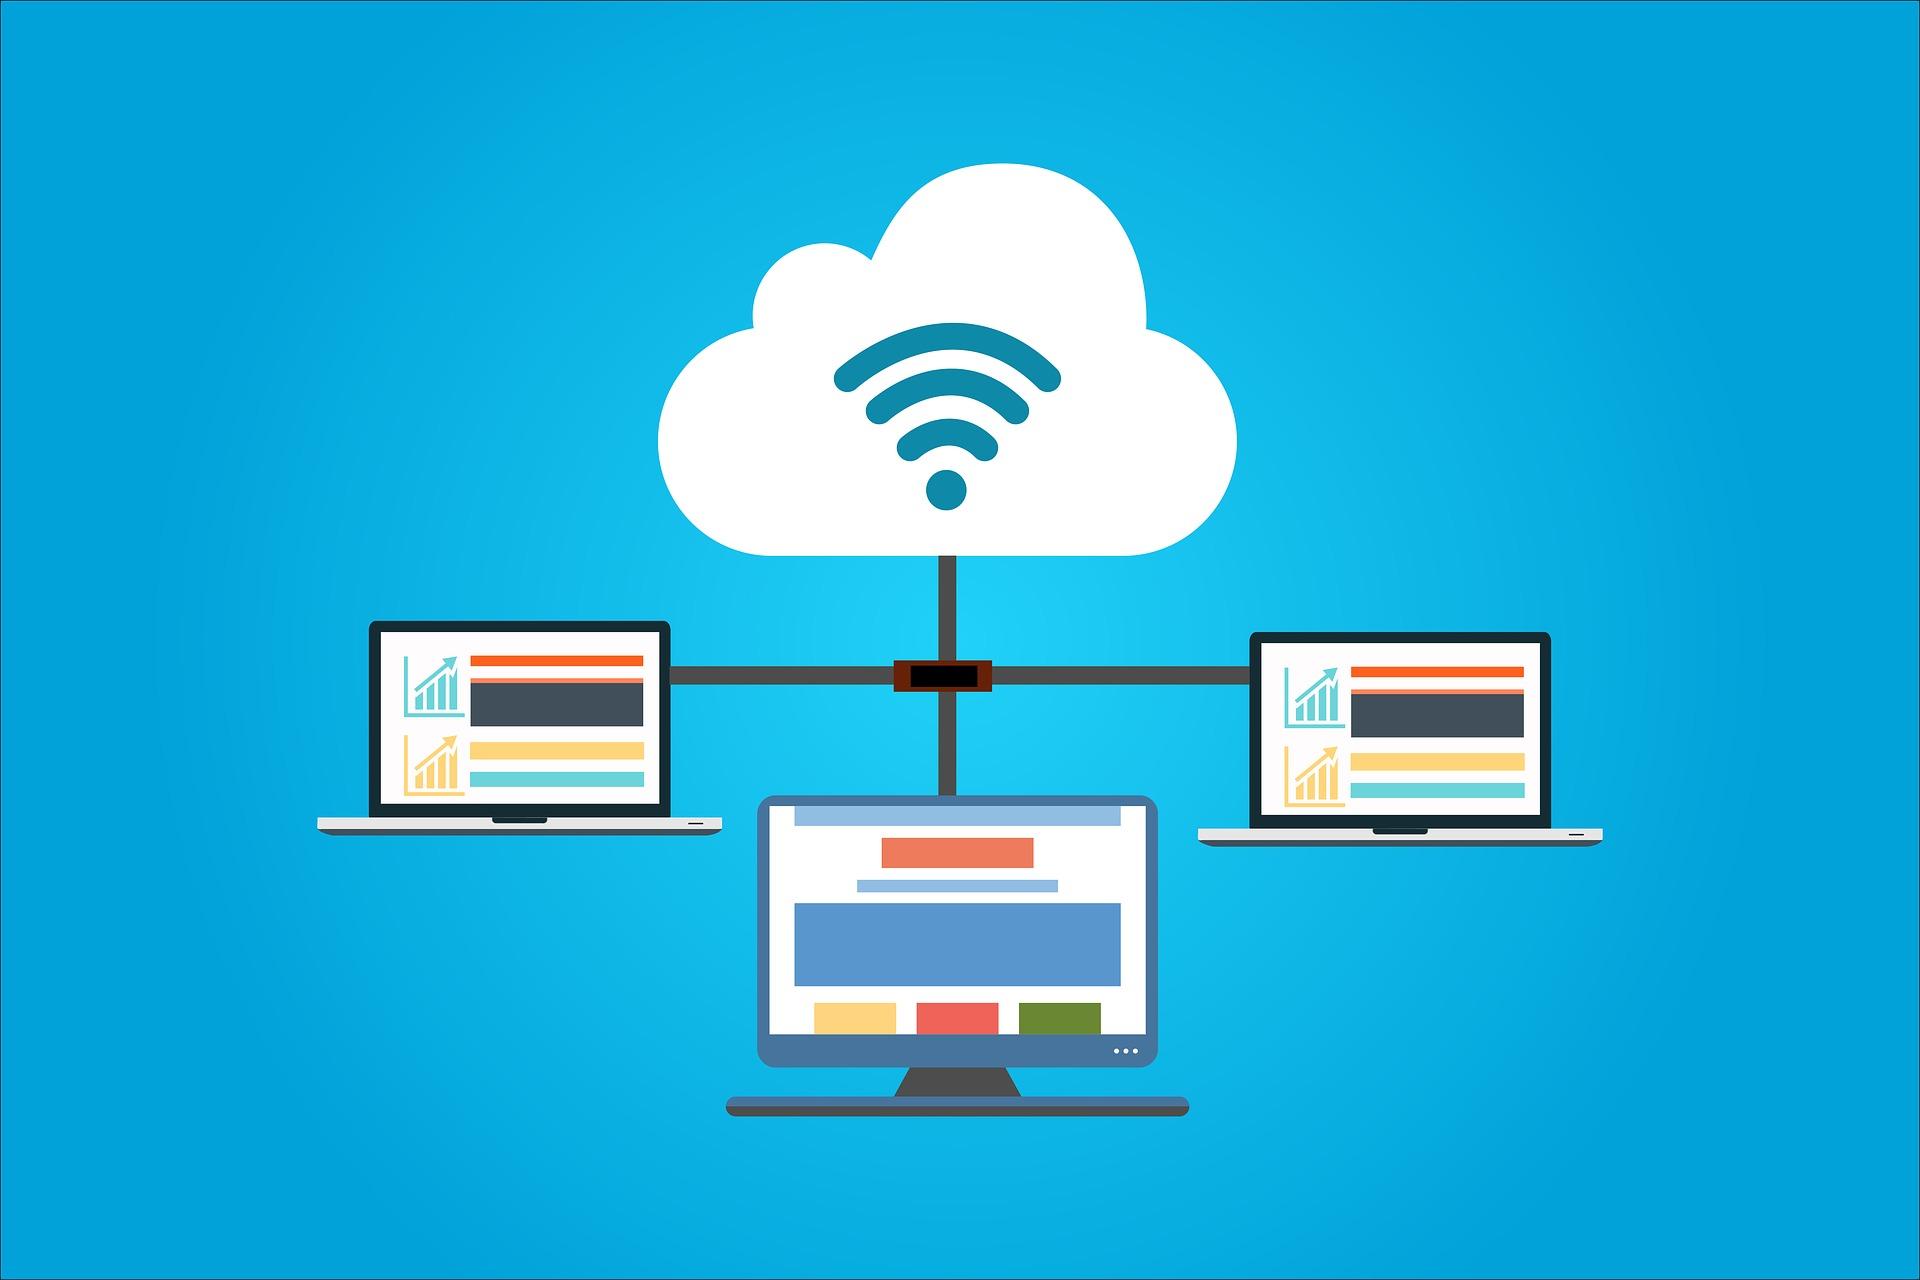 Computers using cloud computing